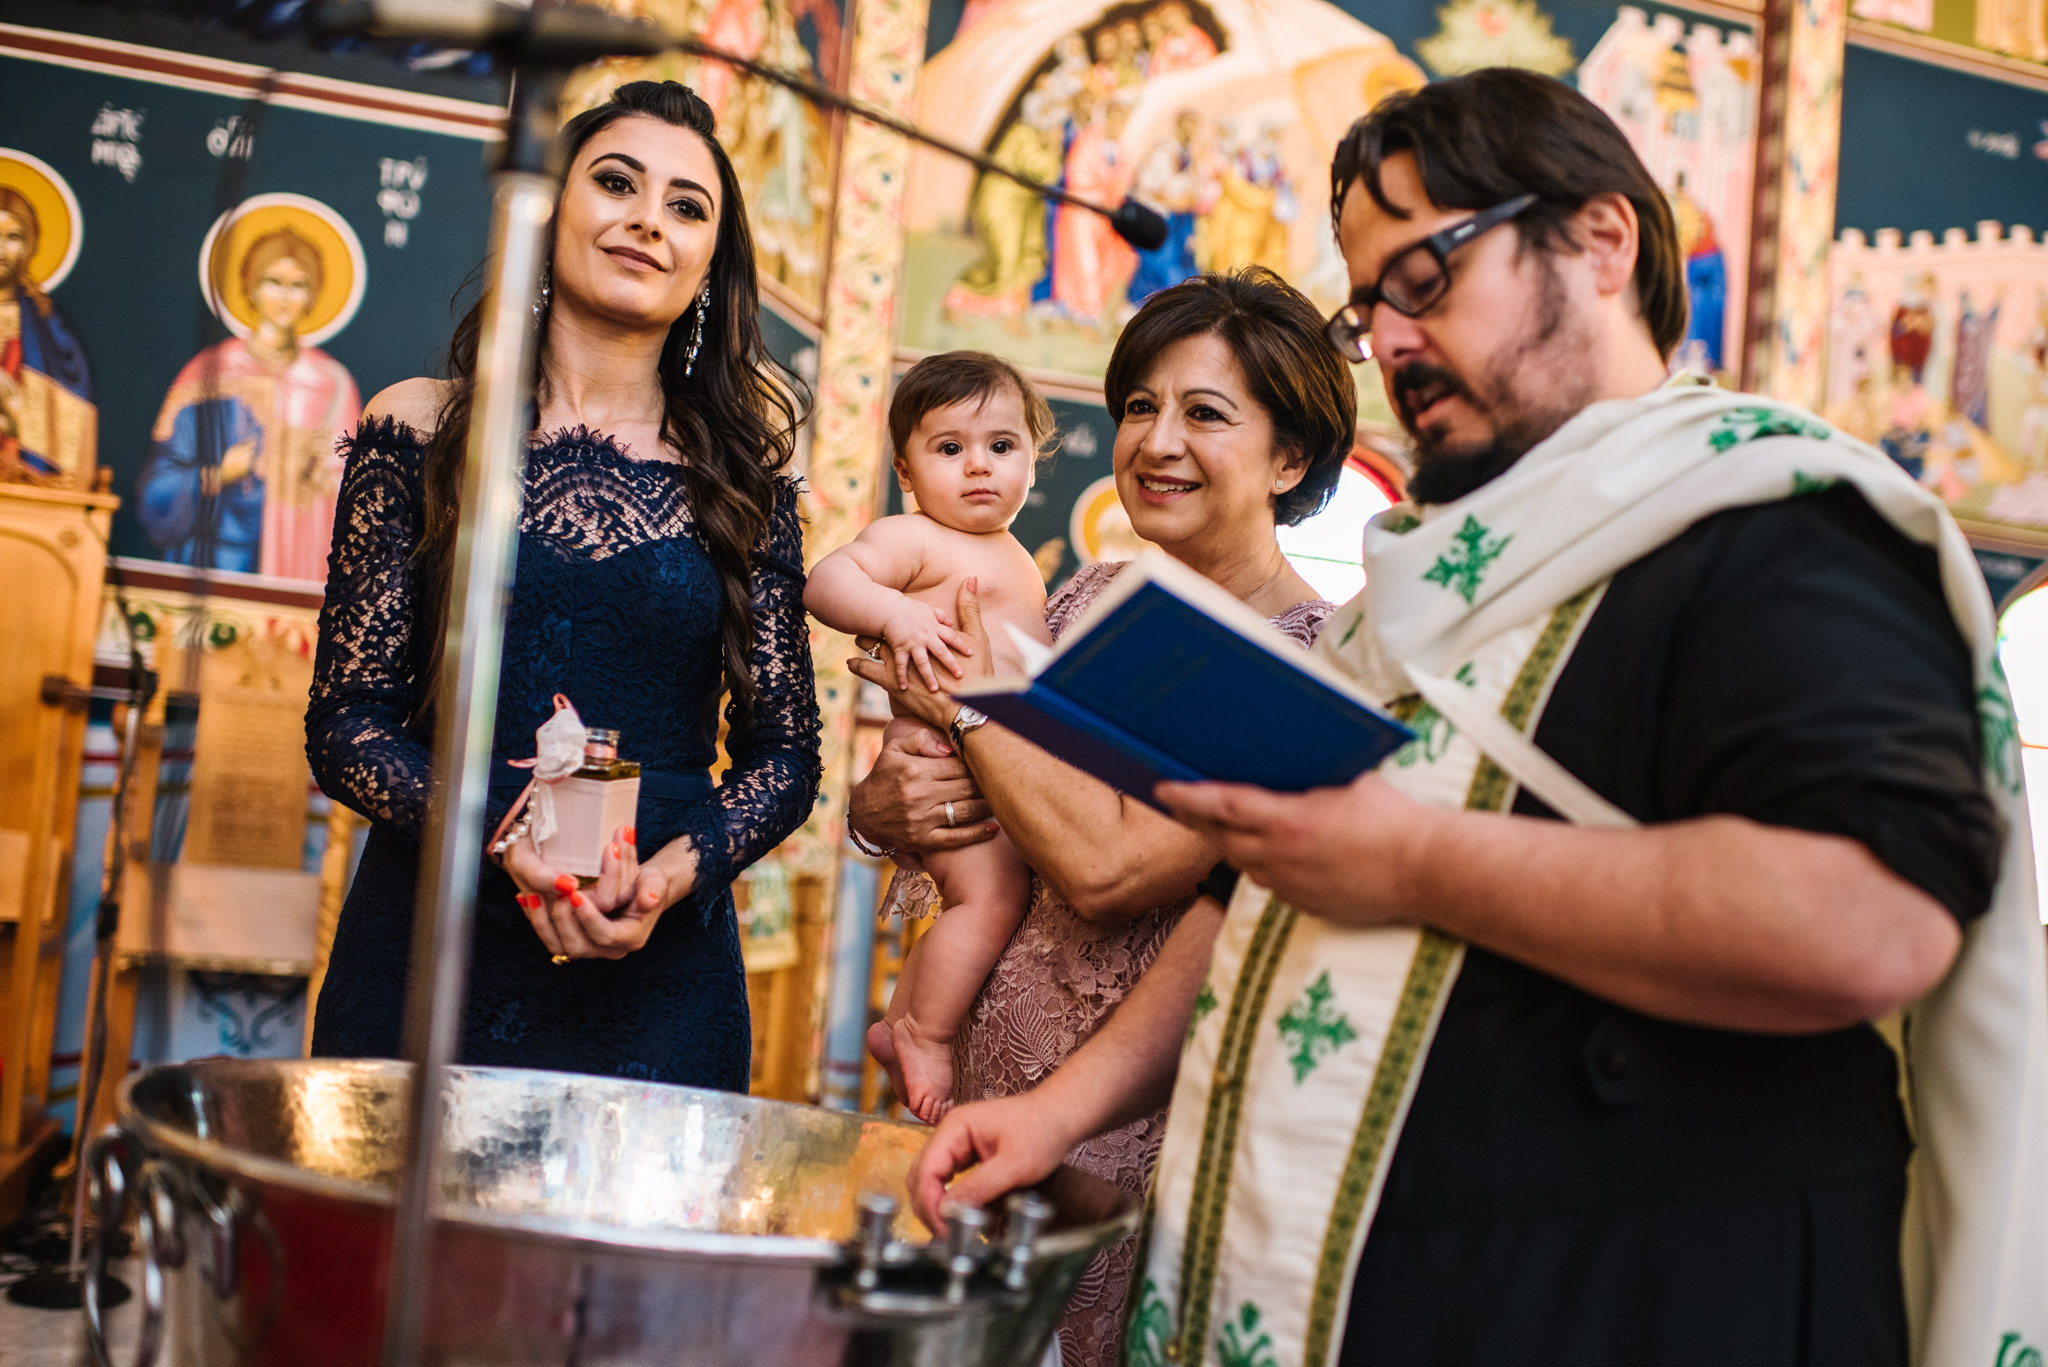 Baby and grandmother Greek orthodox christening